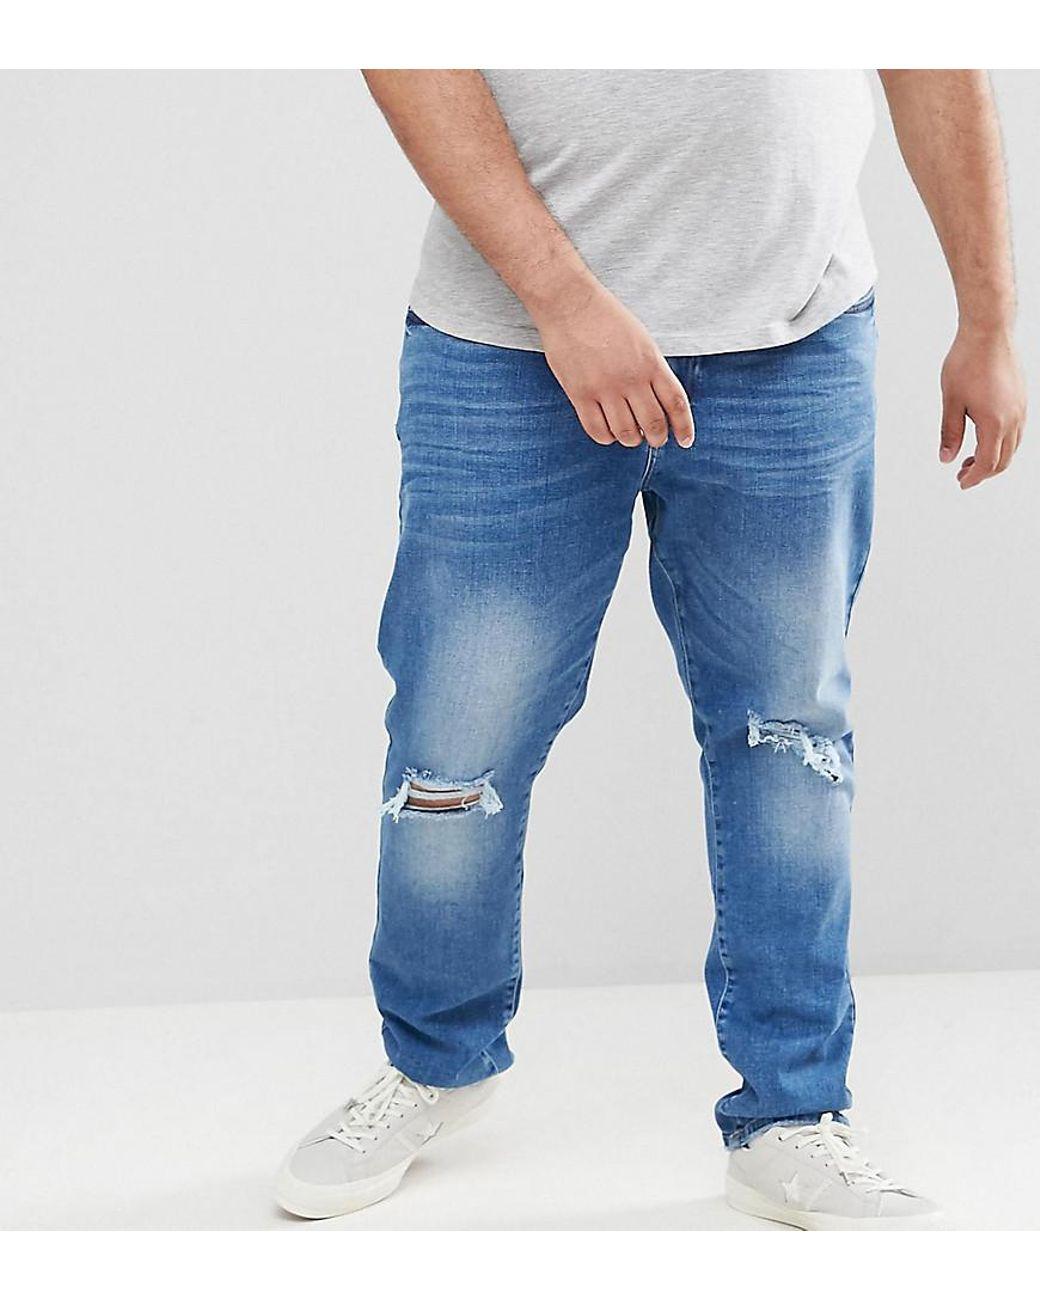 c34d2a6541b Jacamo Skinny Fit Jeans In Rip & Repair In Navy in Blue for Men - Lyst